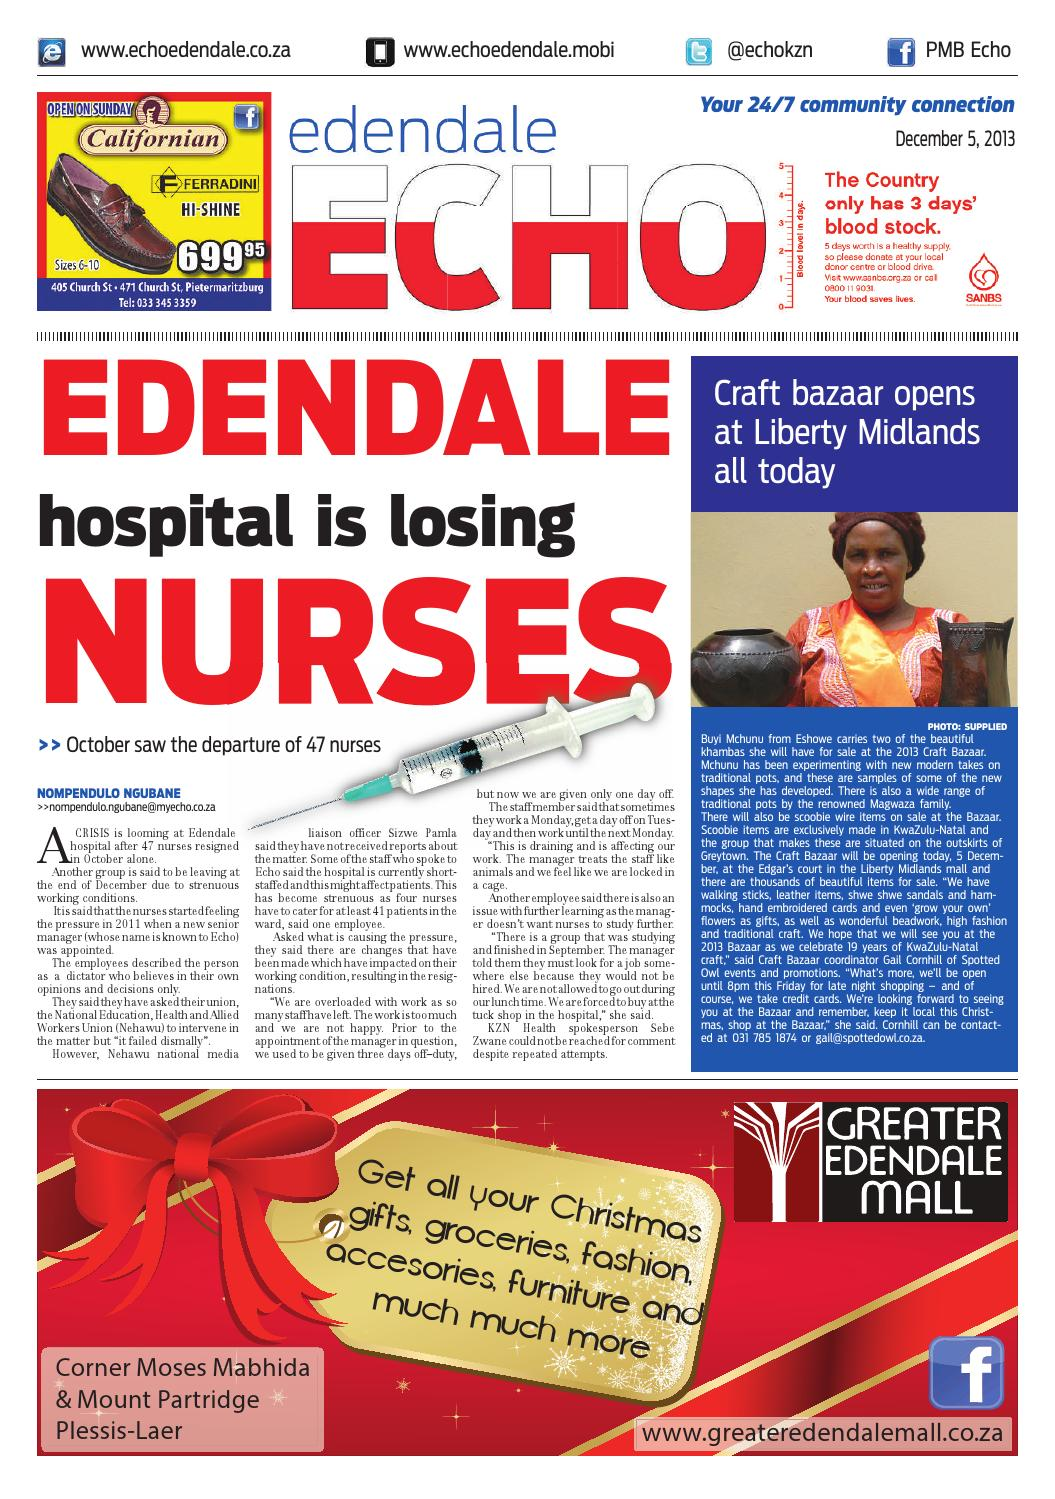 d5e97698b84a4 Echo edendale 5 dec 2013 by Echo Edendale - issuu